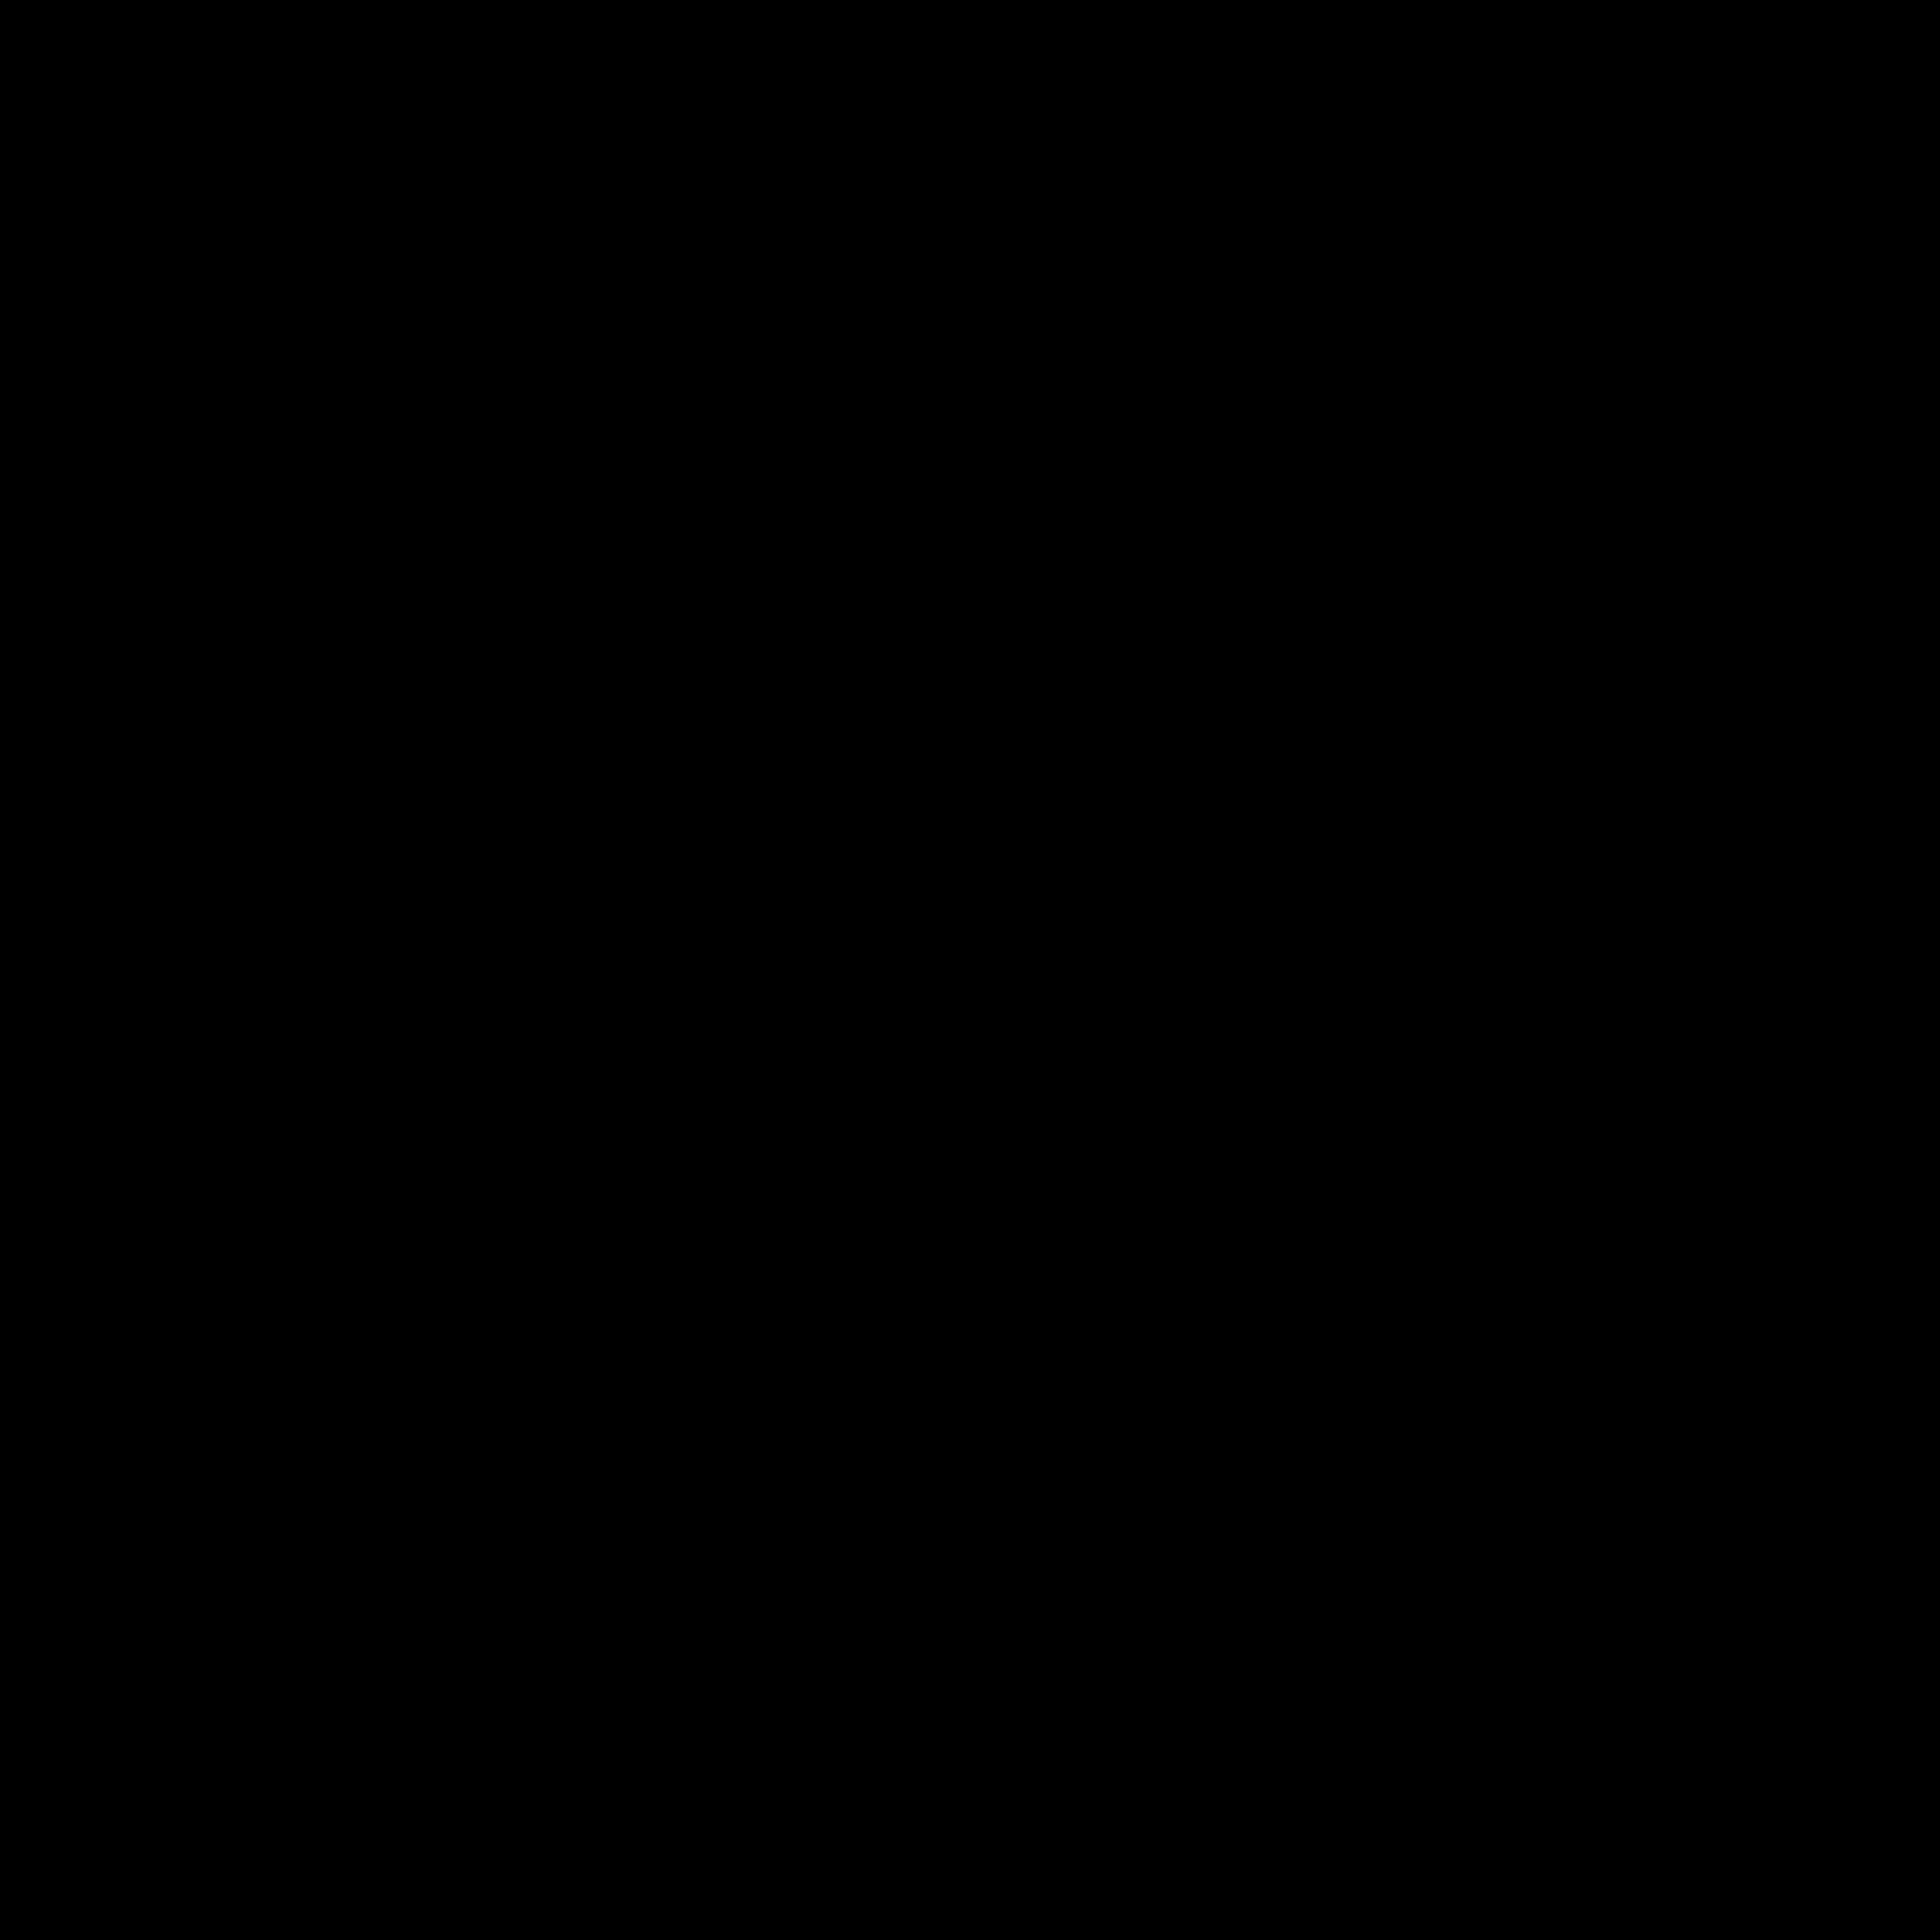 Dots background image